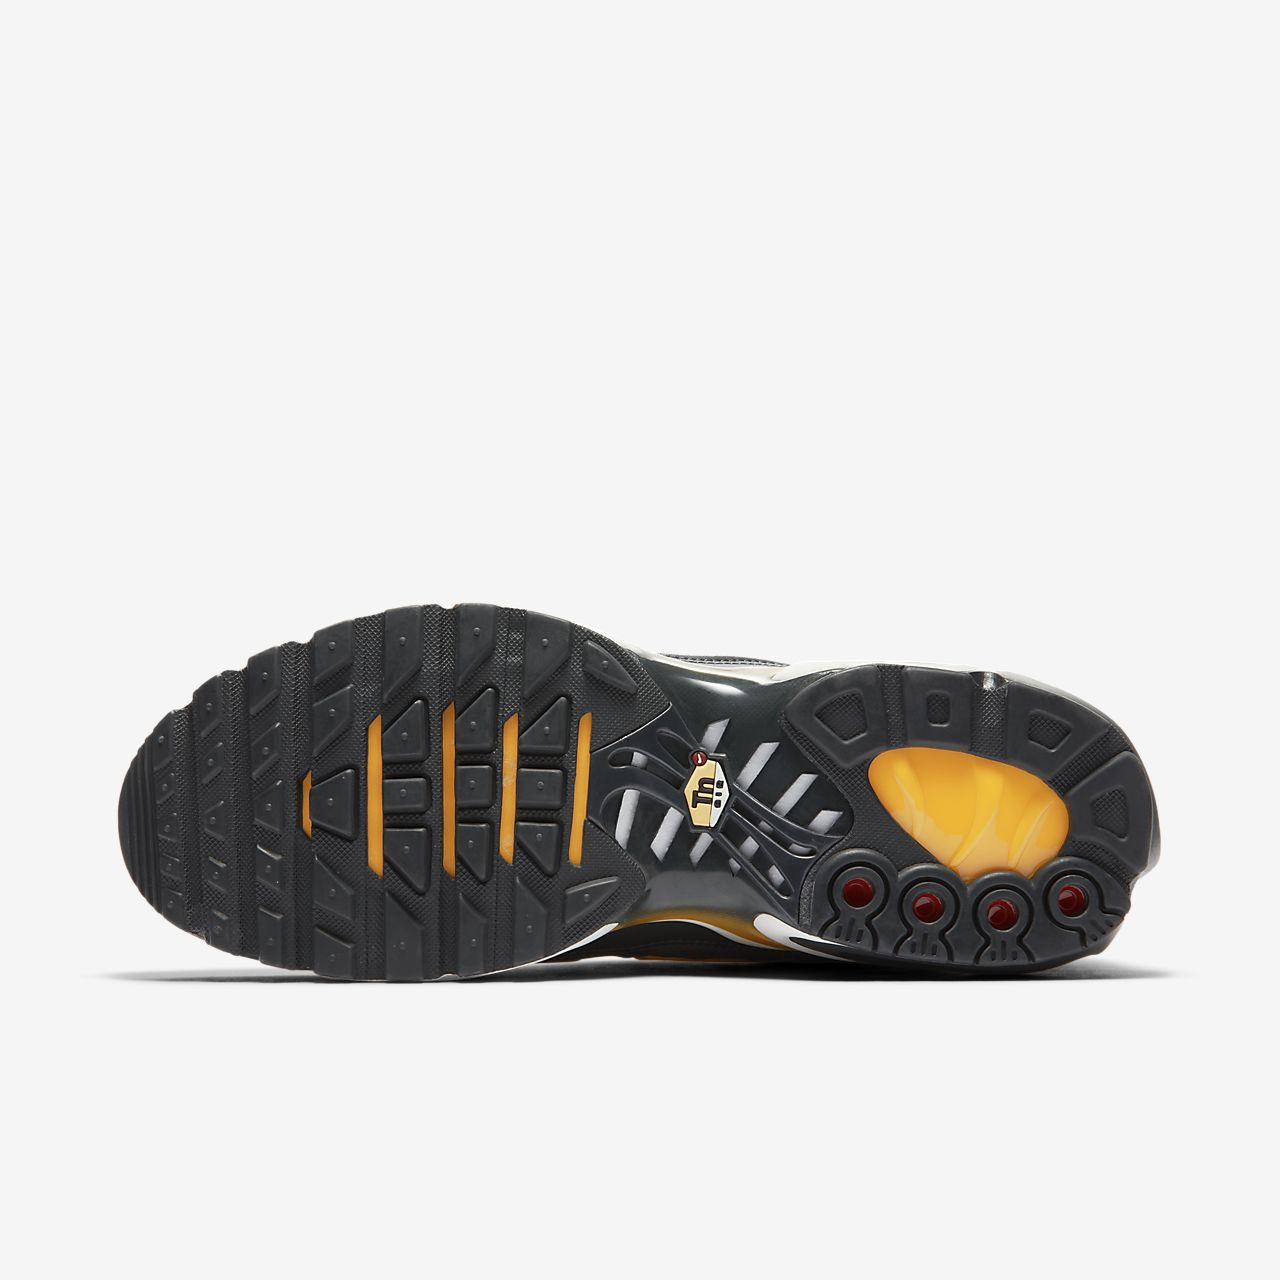 new style e0e9b bd87a ... Nike Air Max Plus SE Men s Shoe